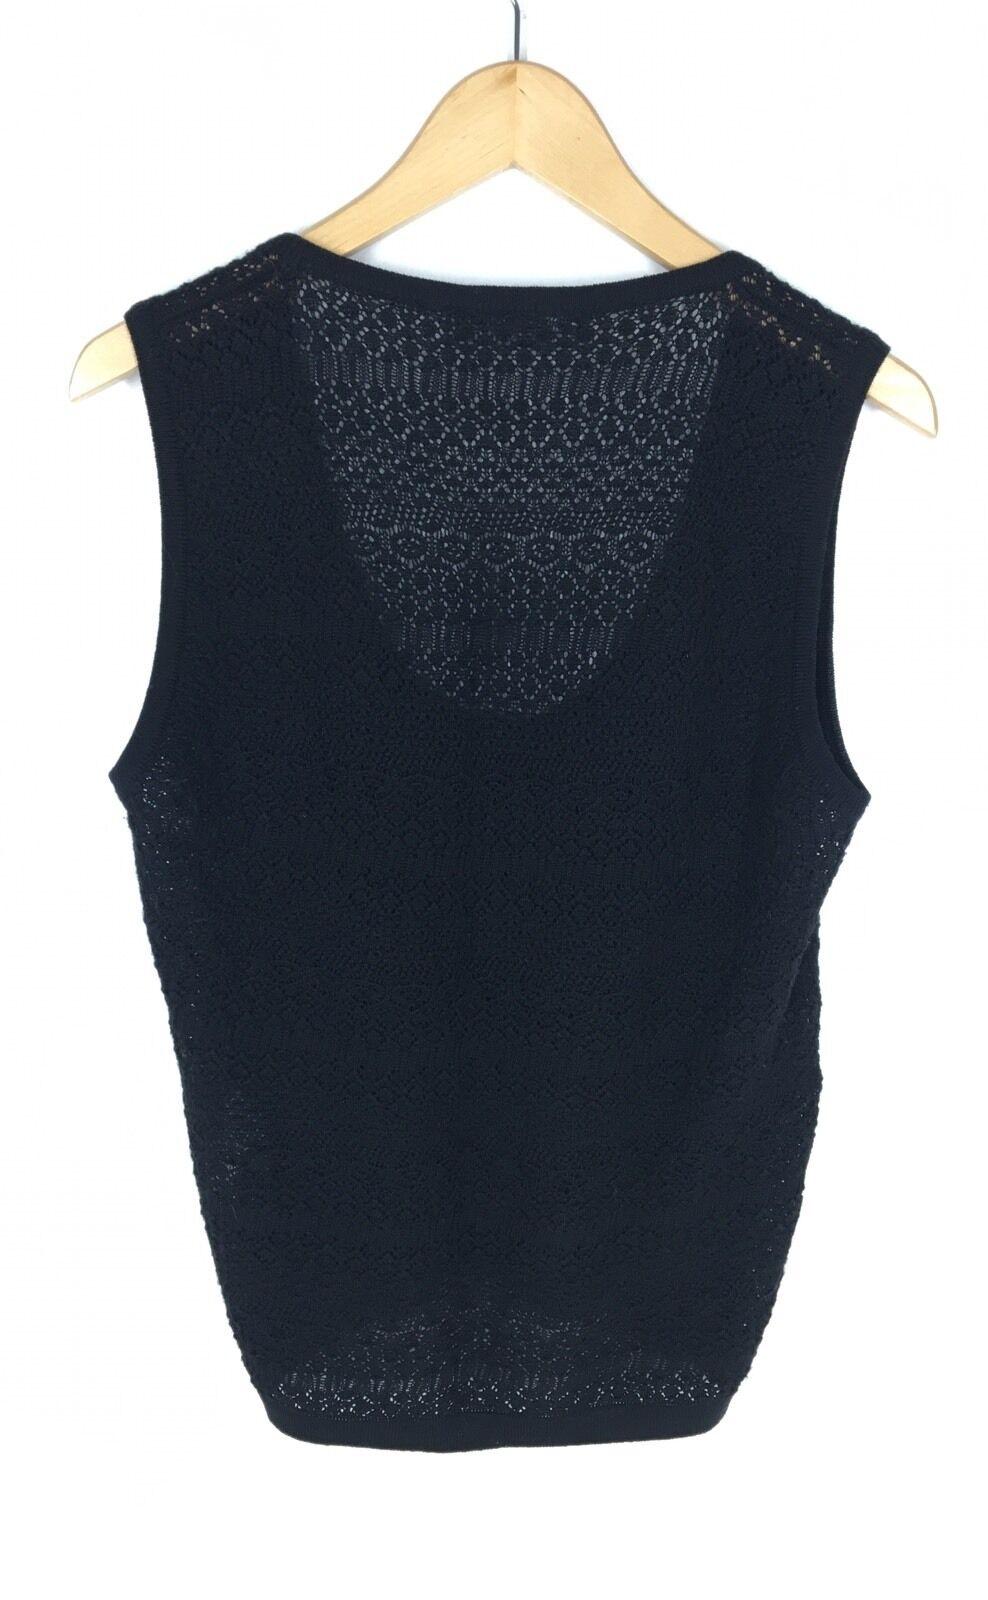 Dolce & Gabbana Size 44 Black Knit Wool Top - image 3